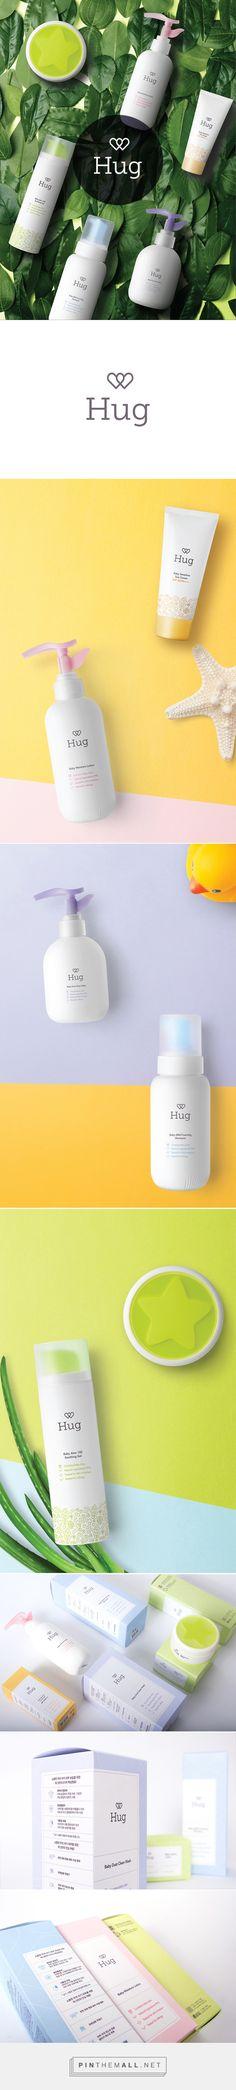 HUG Baby Skincare on Behance - created via https://pinthemall.net